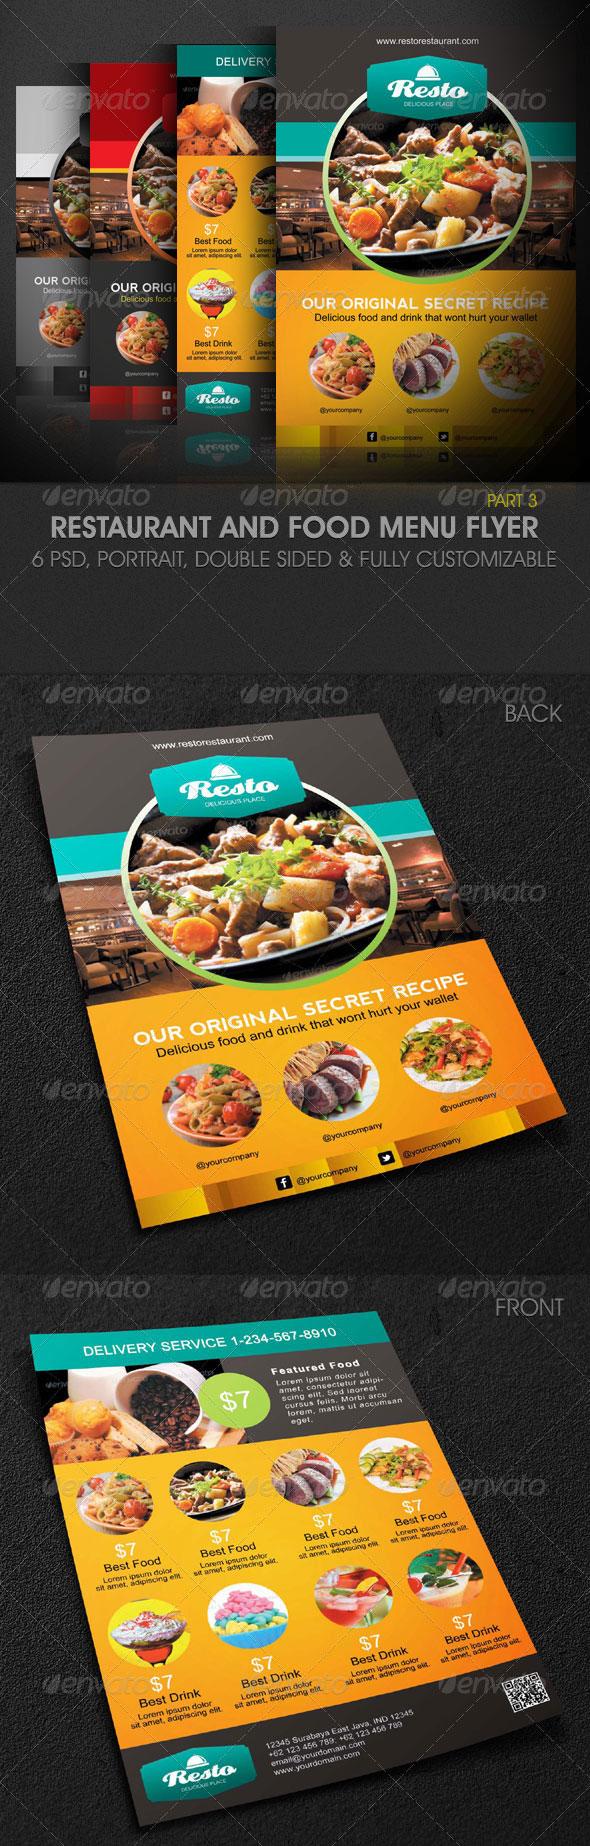 Attractive Modern Restaurant And Food Menu Flyer  Print Design